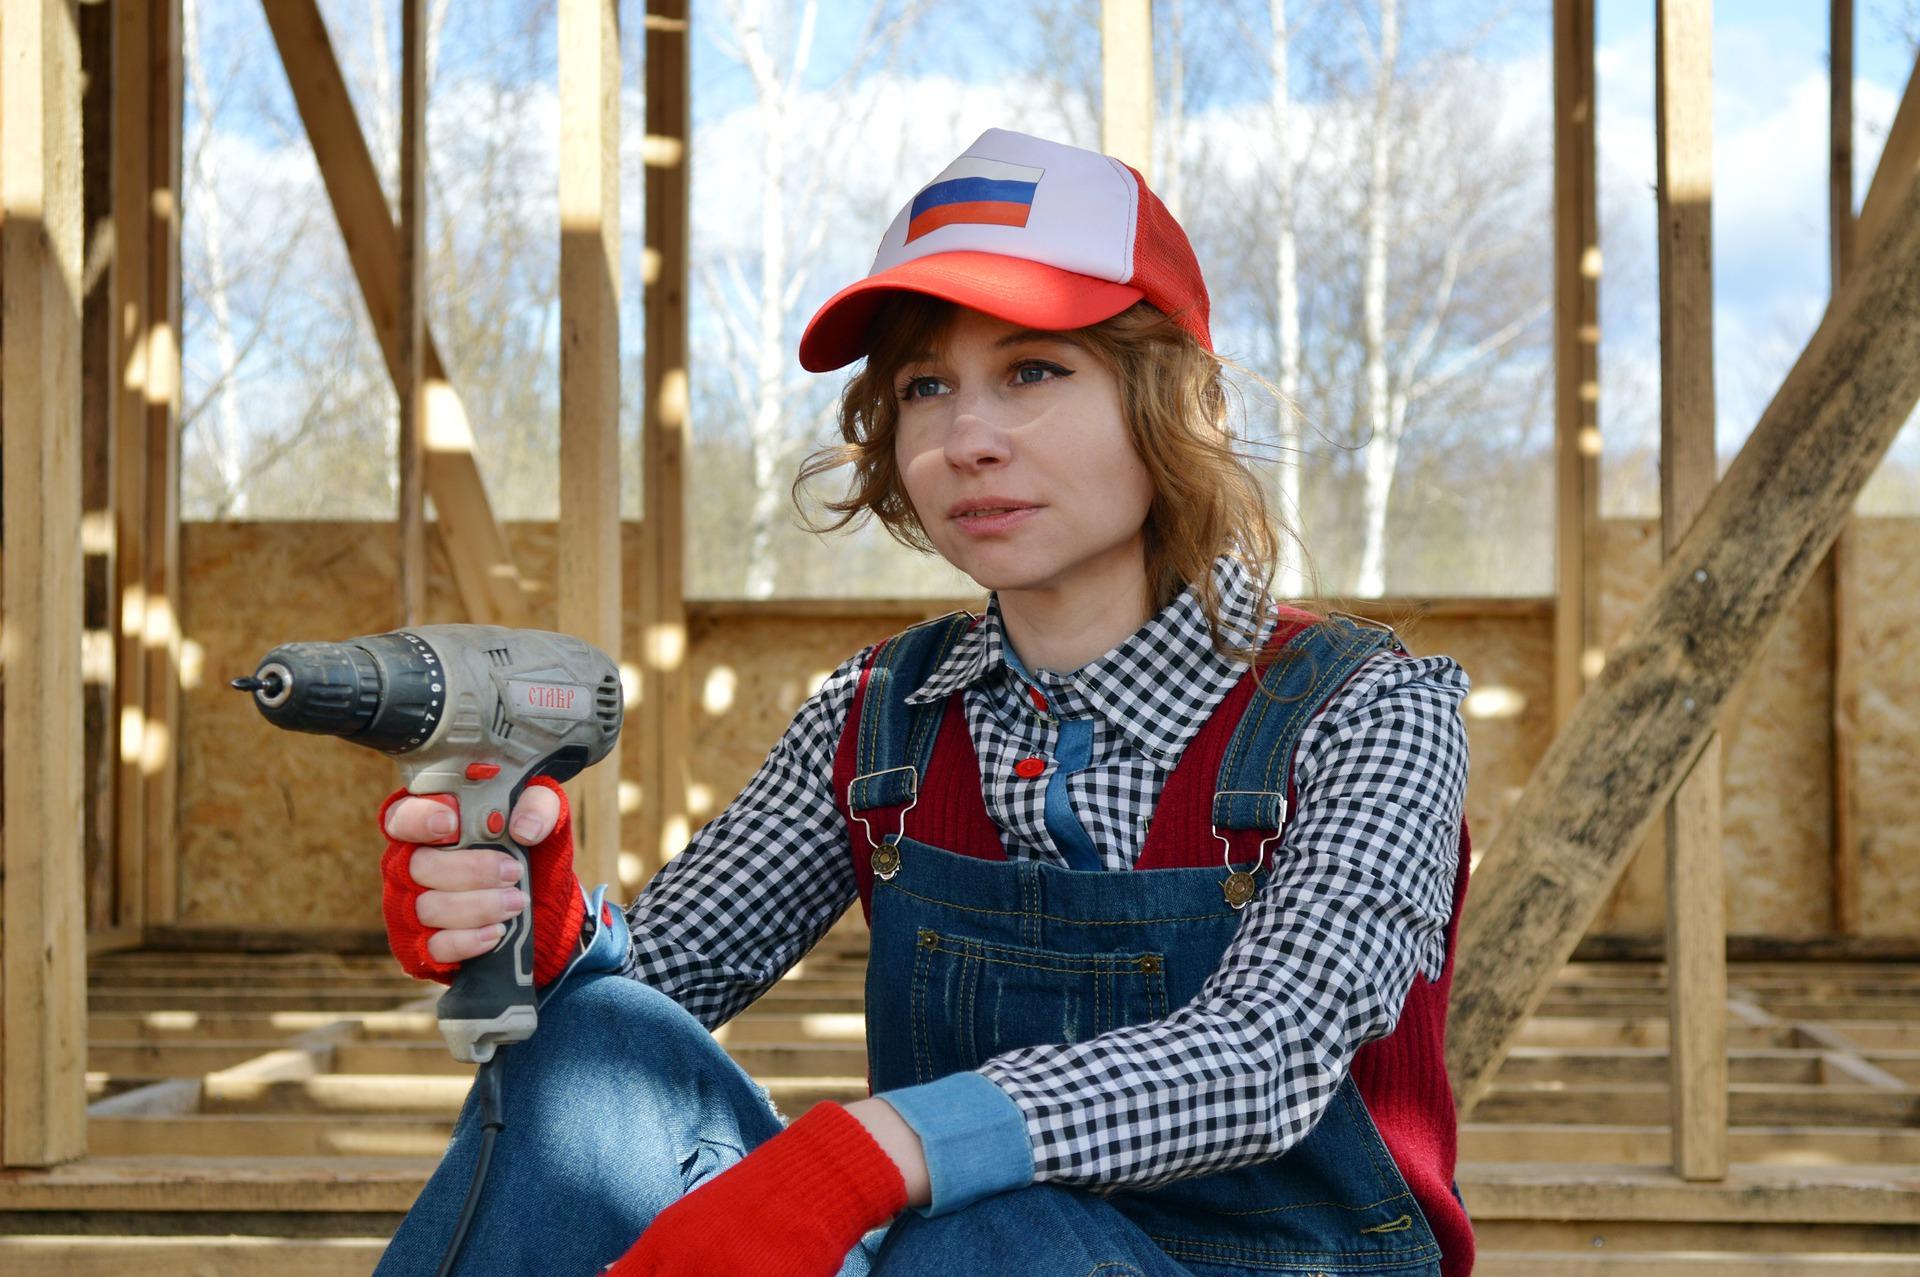 builder 5181073 1920